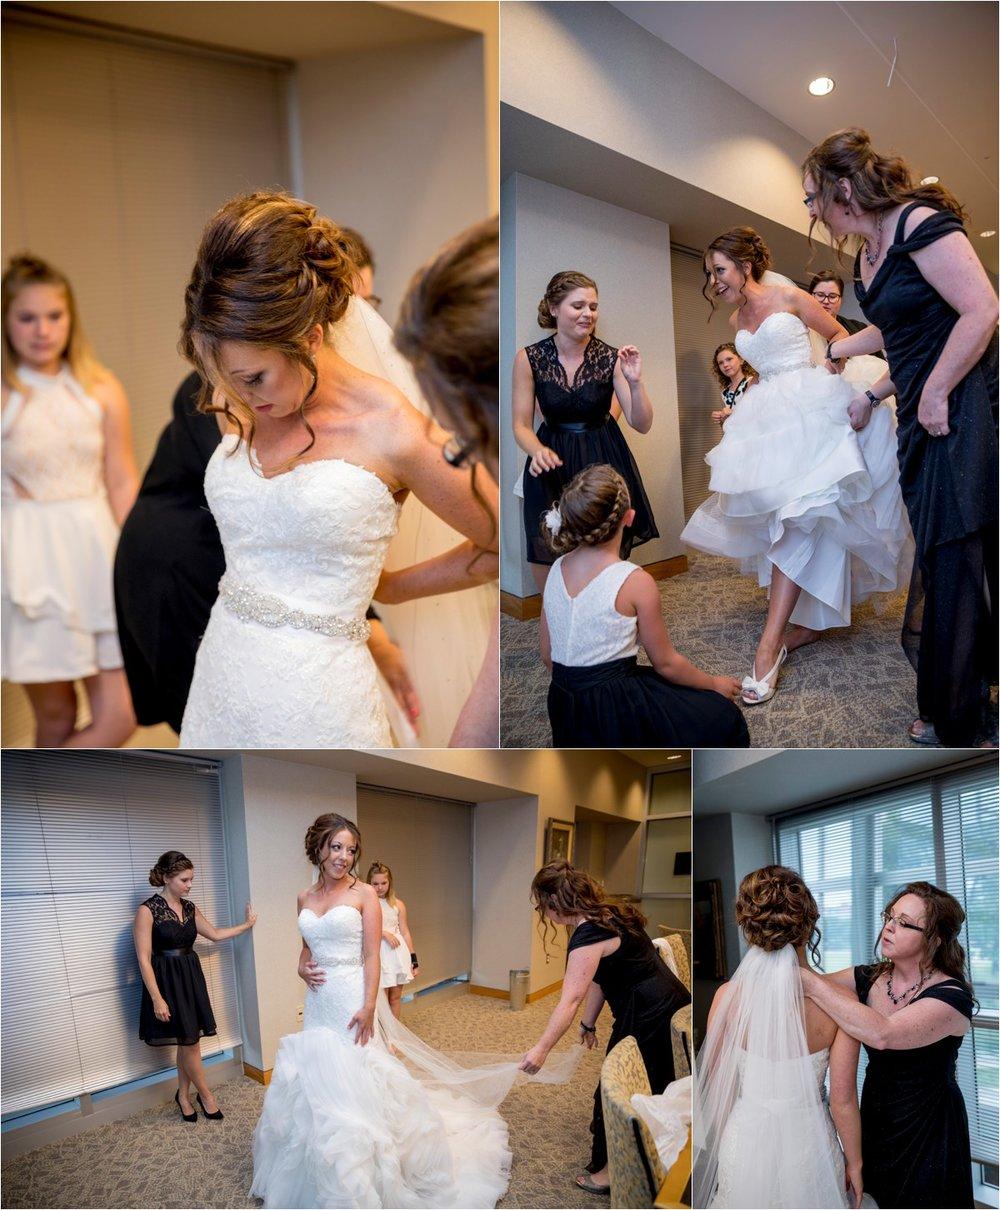 Indiana-state-museum-wedding-06.jpg